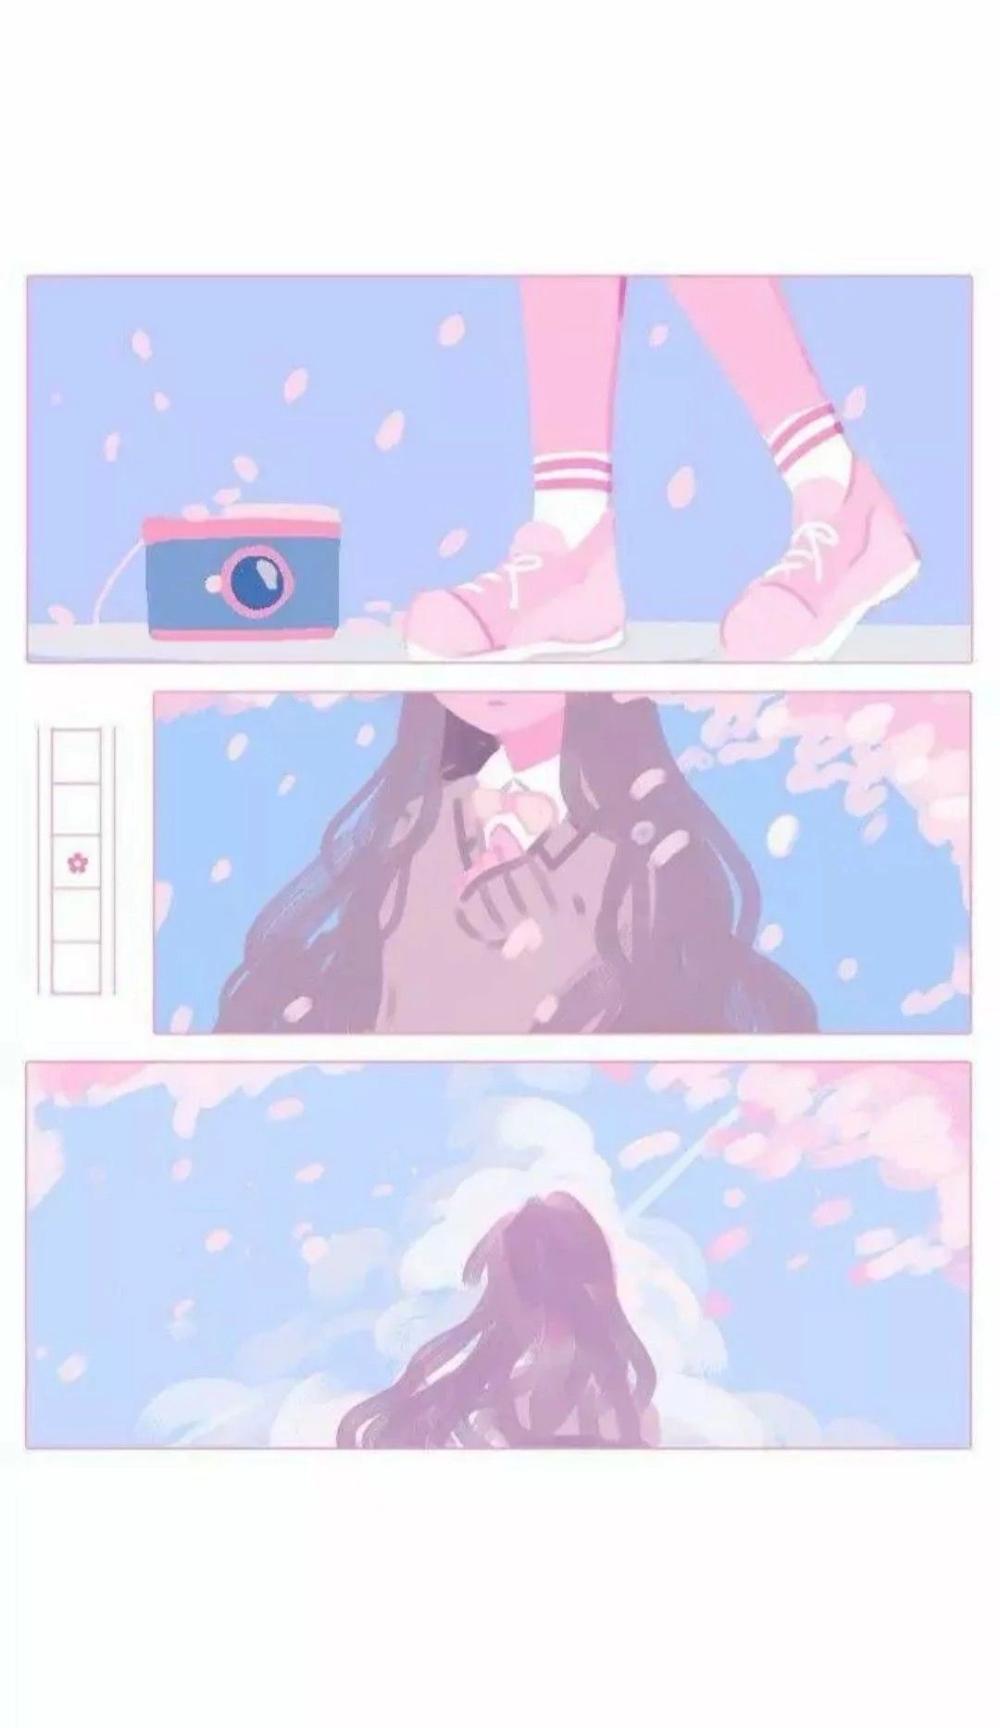 Iphone Soft Aesthetic Iphone Aesthetic Wallpapers Anime In 2020 Aesthetic Anime Anime Wallpaper Cute Art